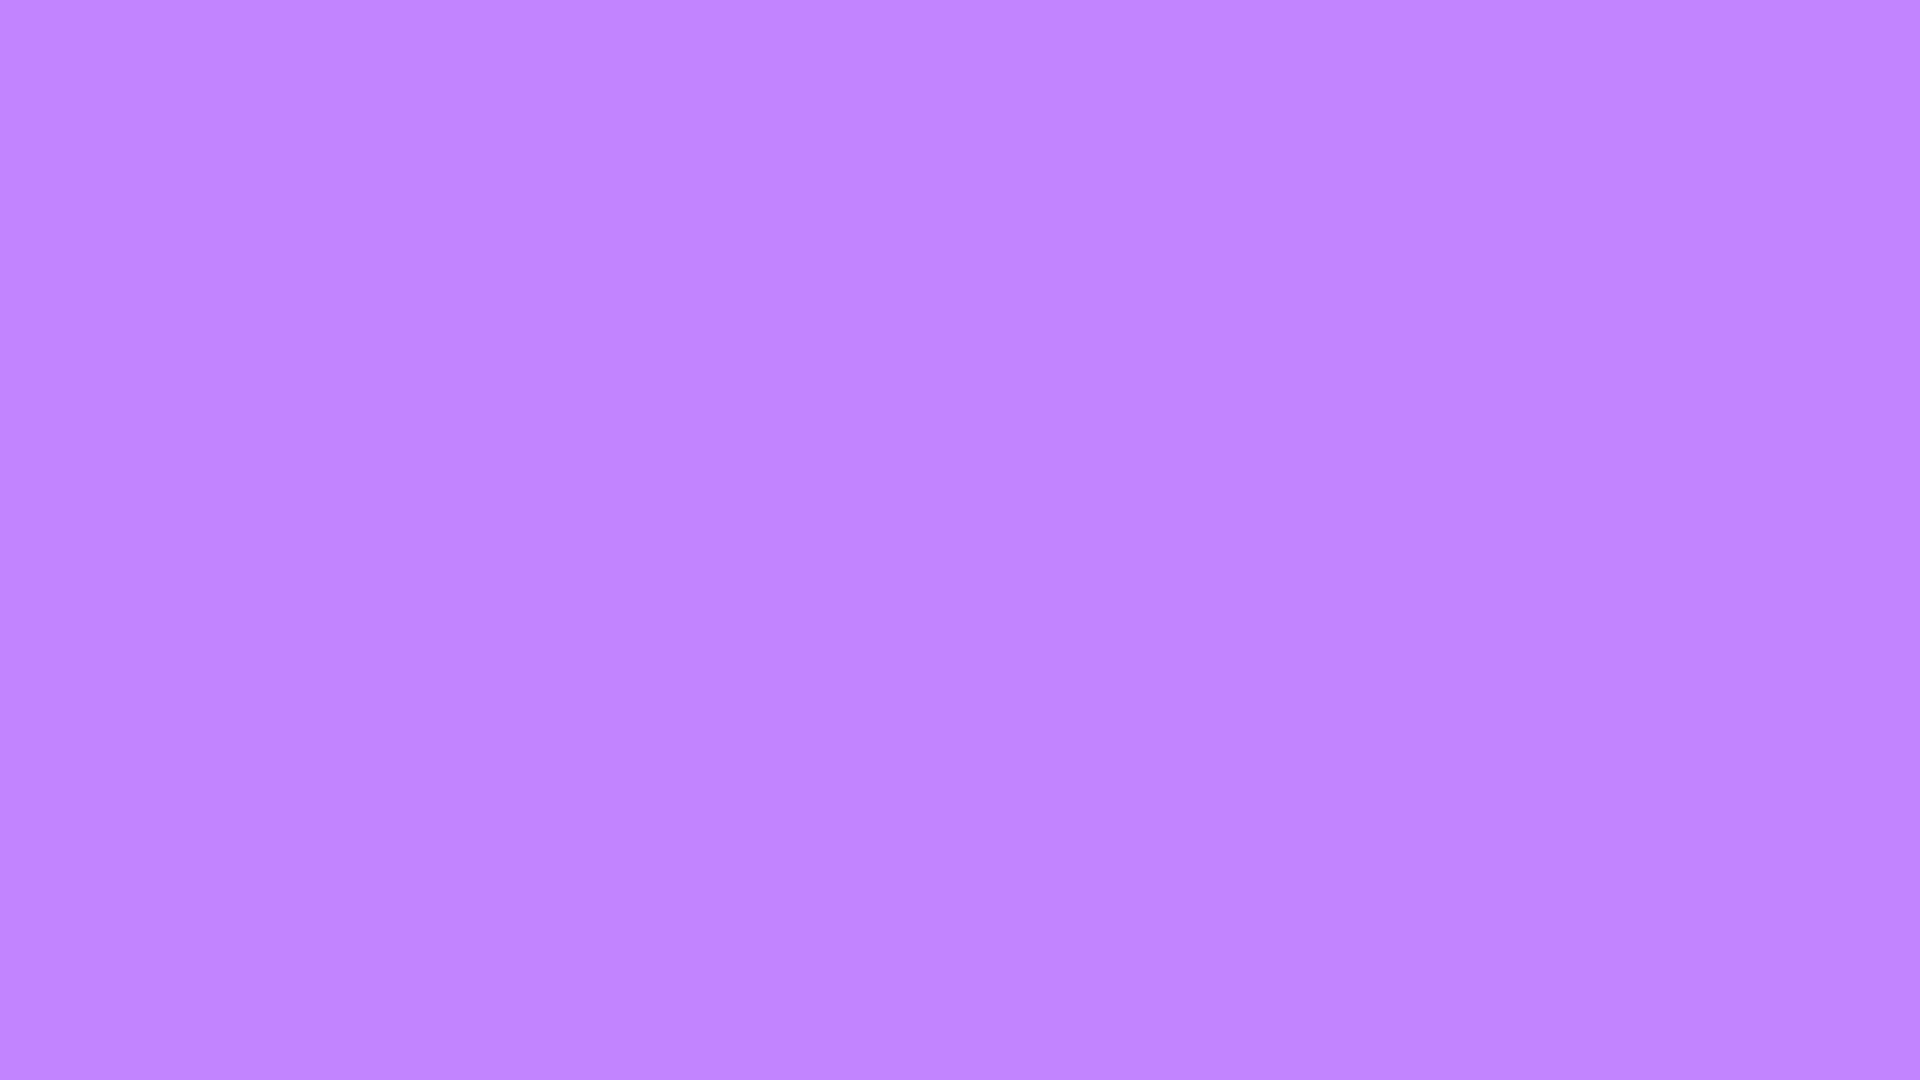 Plain Purple Wallpapers Top Free Plain Purple Backgrounds Wallpaperaccess